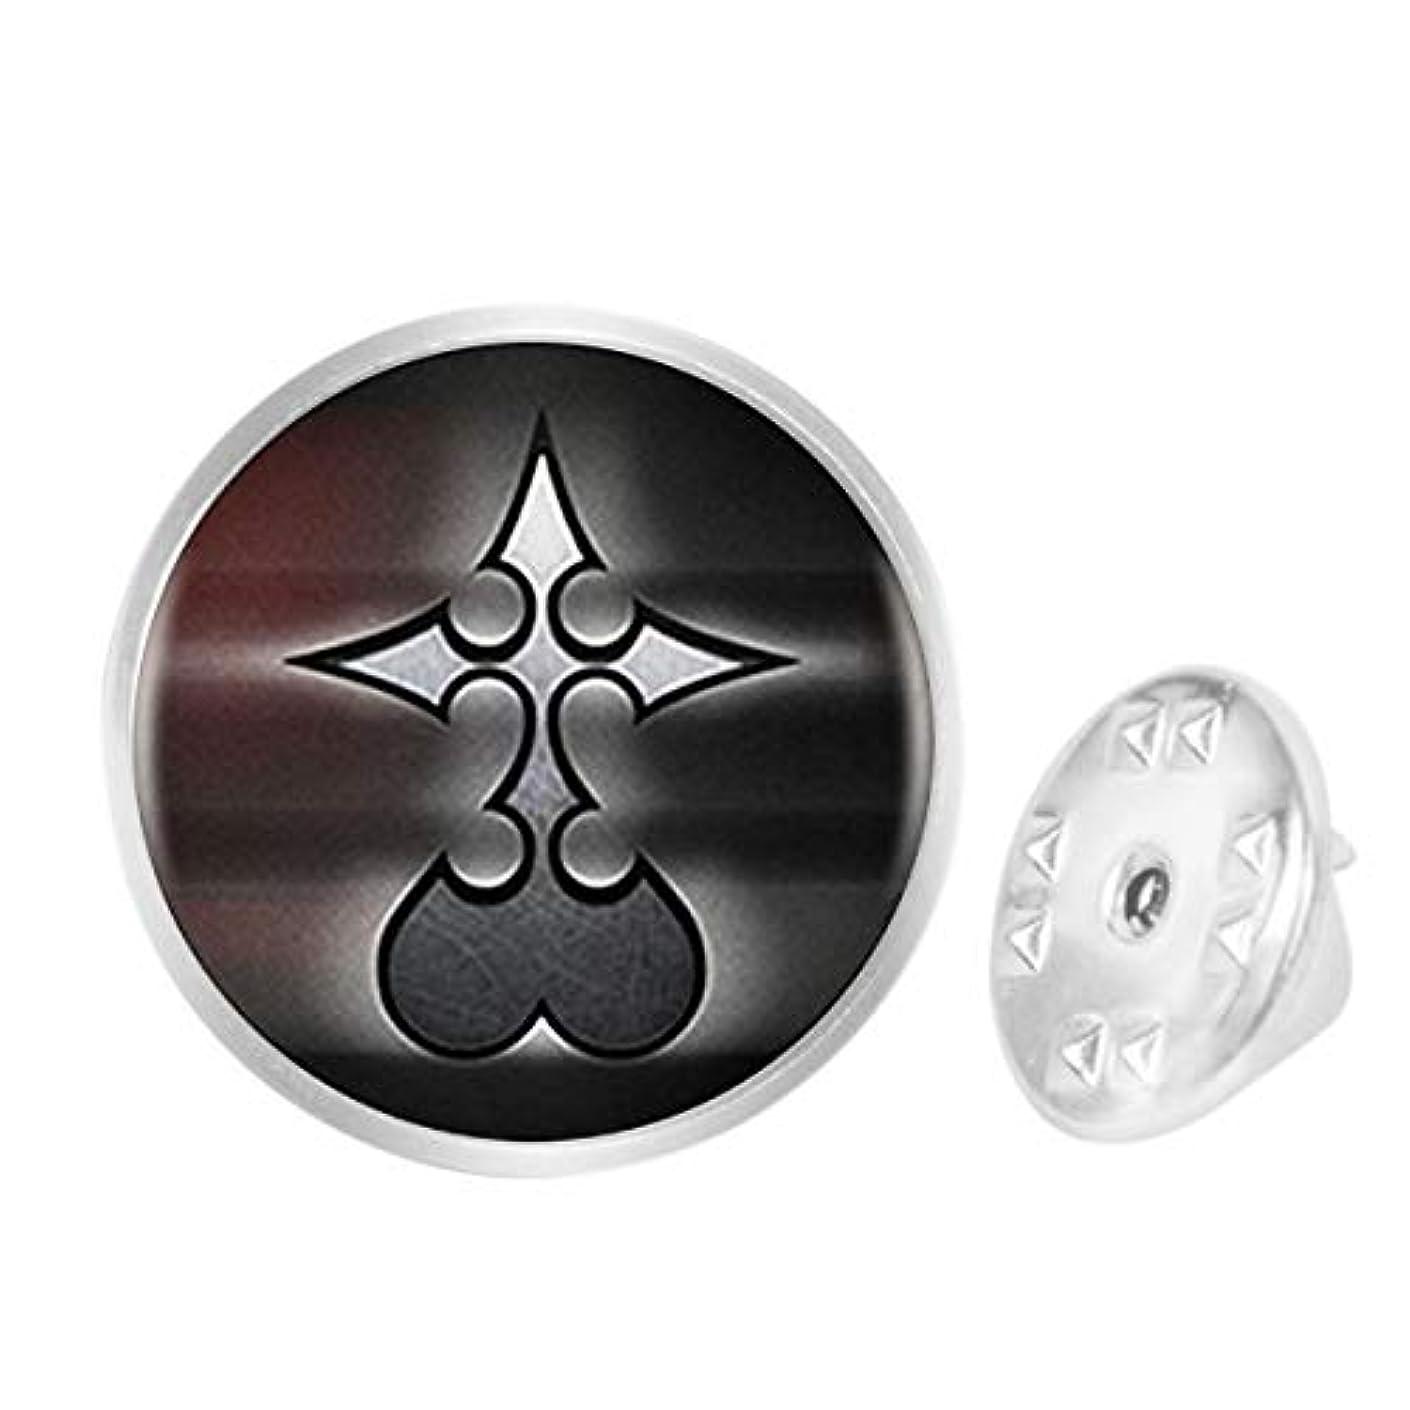 WAZZIT Round Metal Tie Tack Hat Lapel Pin Brooches Kingdom Hearts Nobody Logo Banquet Badge Enamel Pins Trendy Accessory Jacket T-Shirt